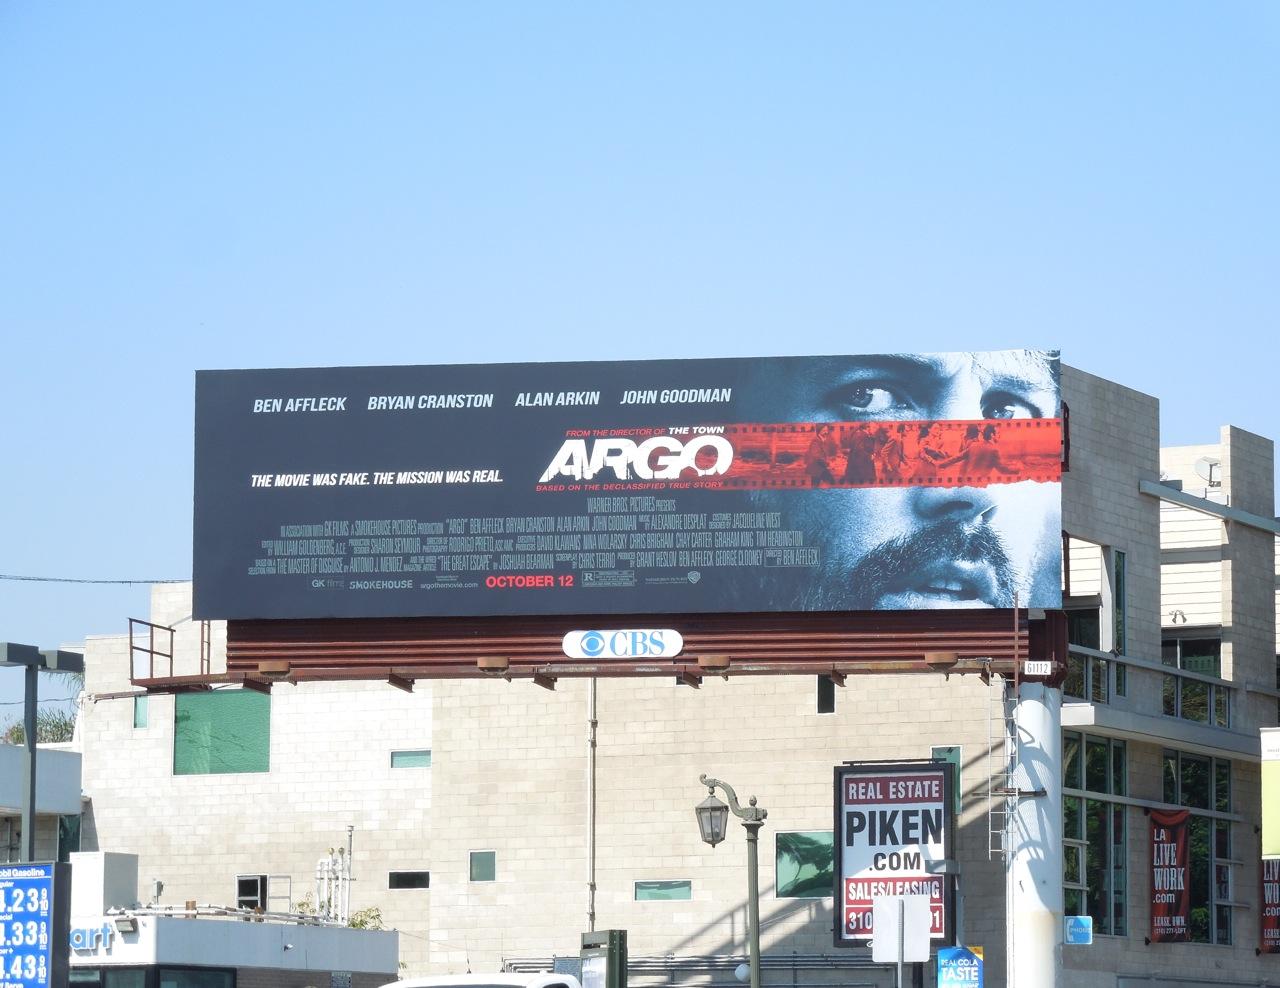 http://4.bp.blogspot.com/-Hs3LnPSqU7c/UGU_7UGp4mI/AAAAAAAA1WY/W6ovGmtY-fo/s1600/Argo+movie+billboard.jpg